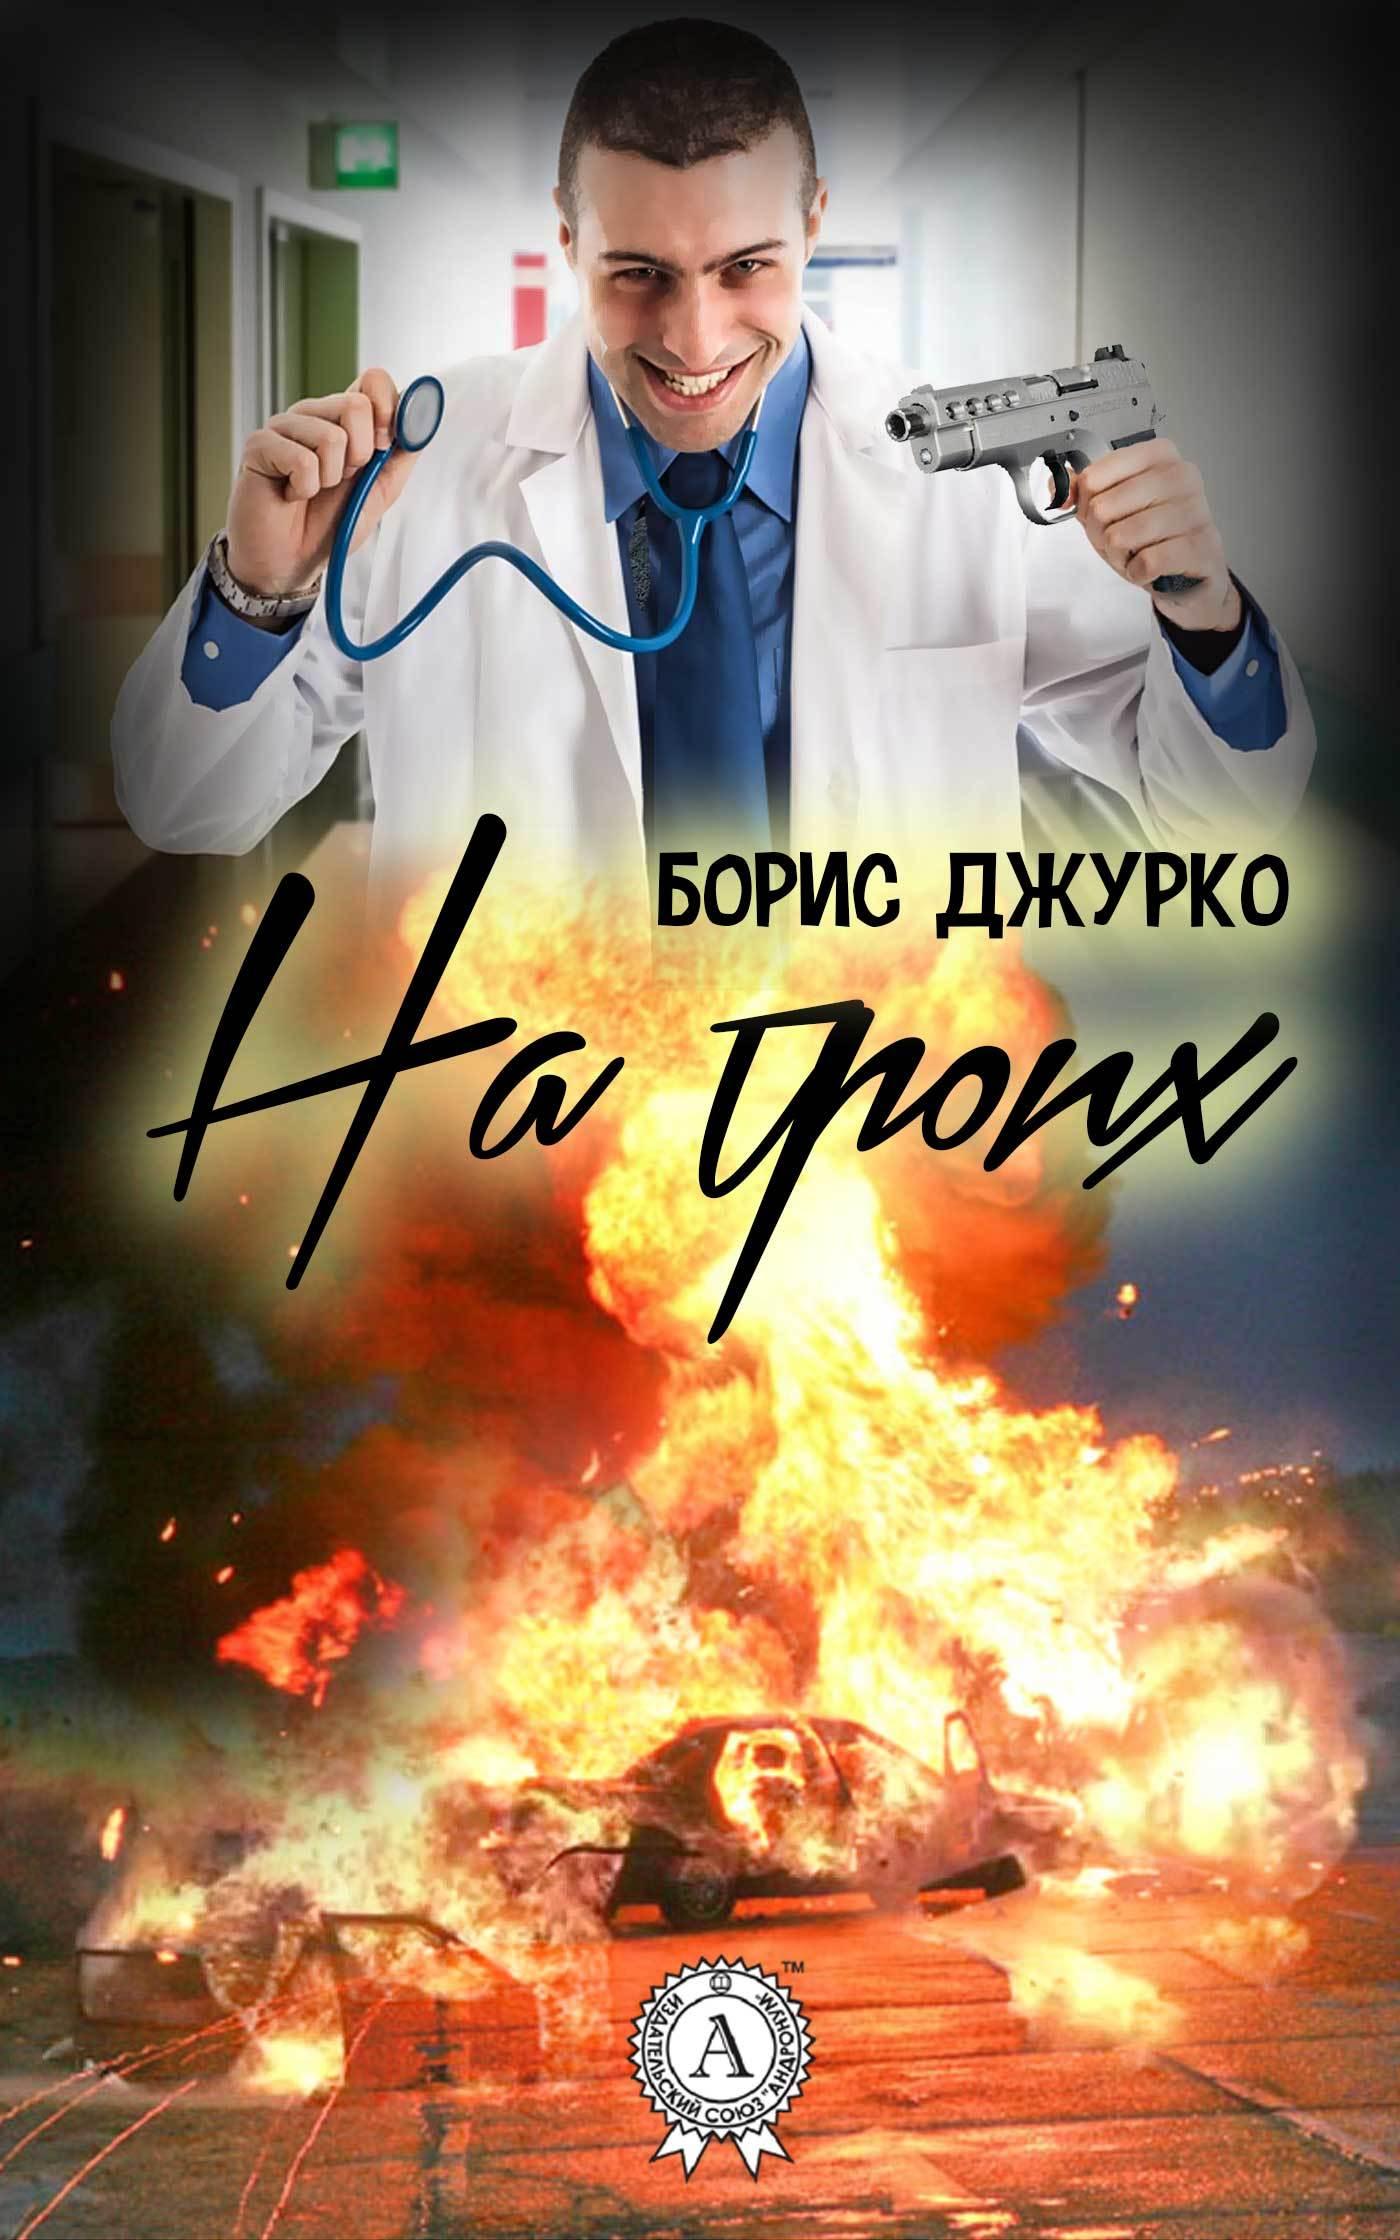 Борис Джурко бесплатно